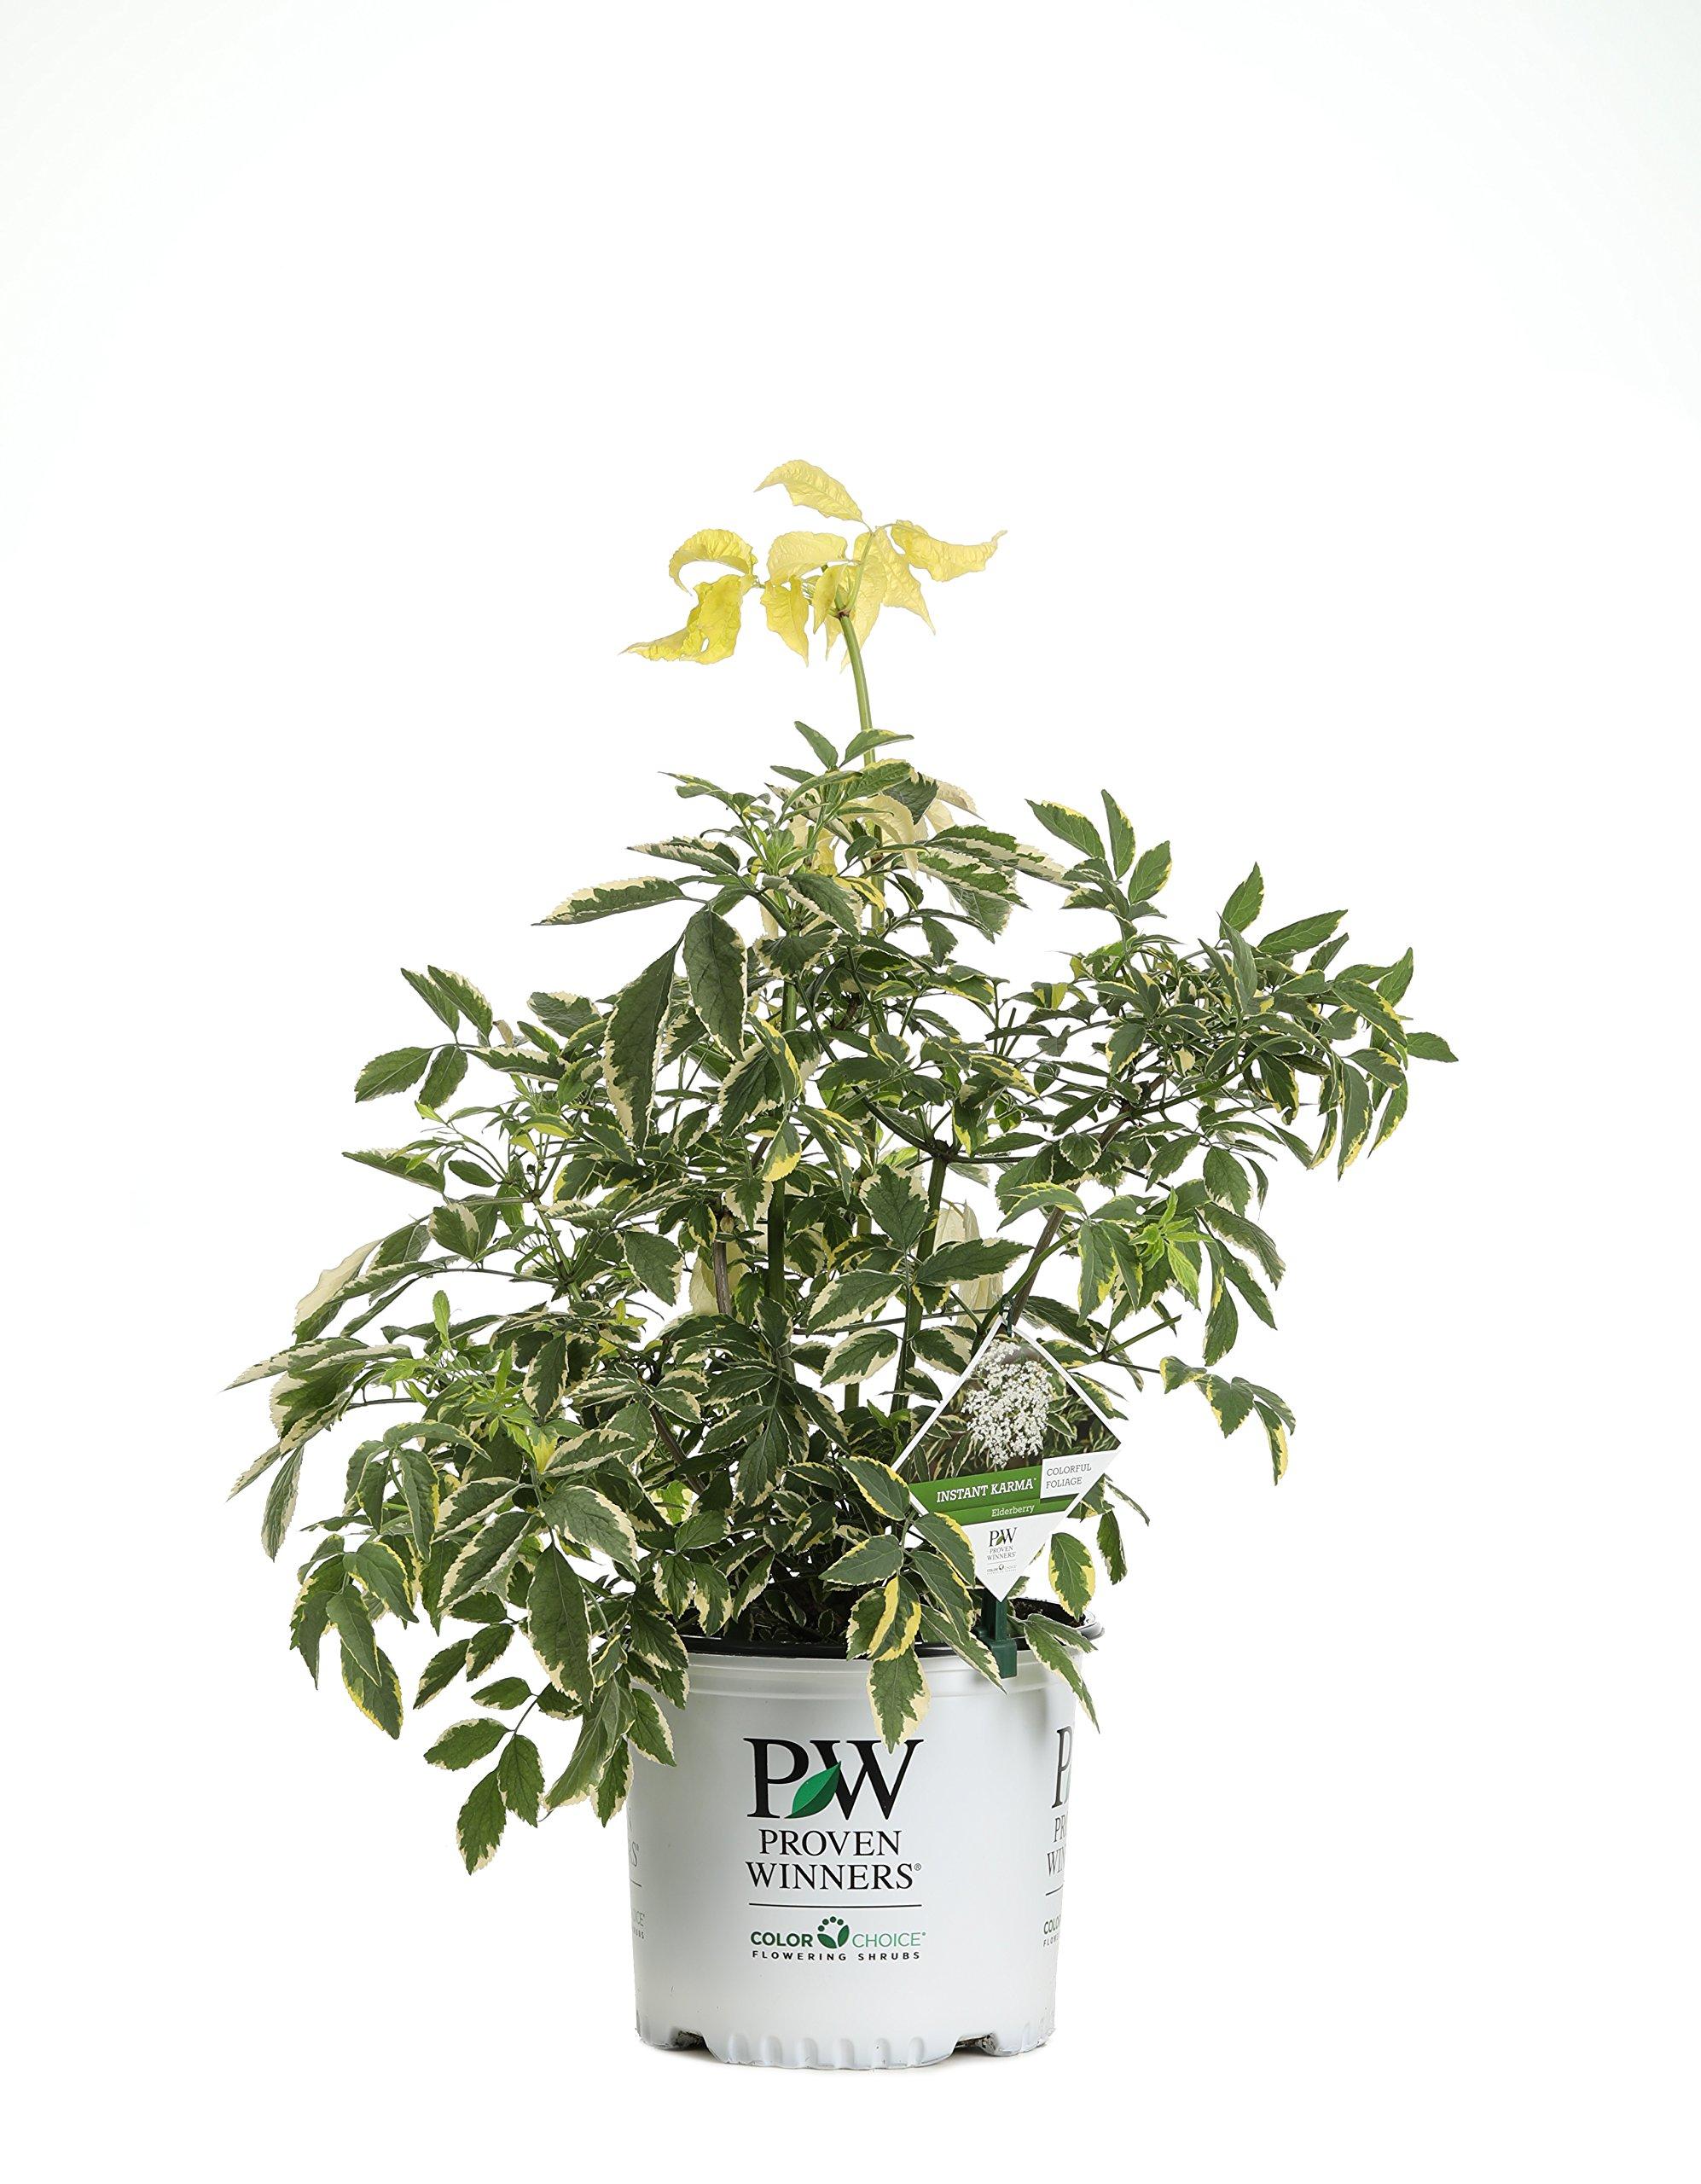 Instant Karma Elderberry (Sambucus) Live Shrub, White Flowers and Variegated Foliage, 3 Gallon by Proven Winners